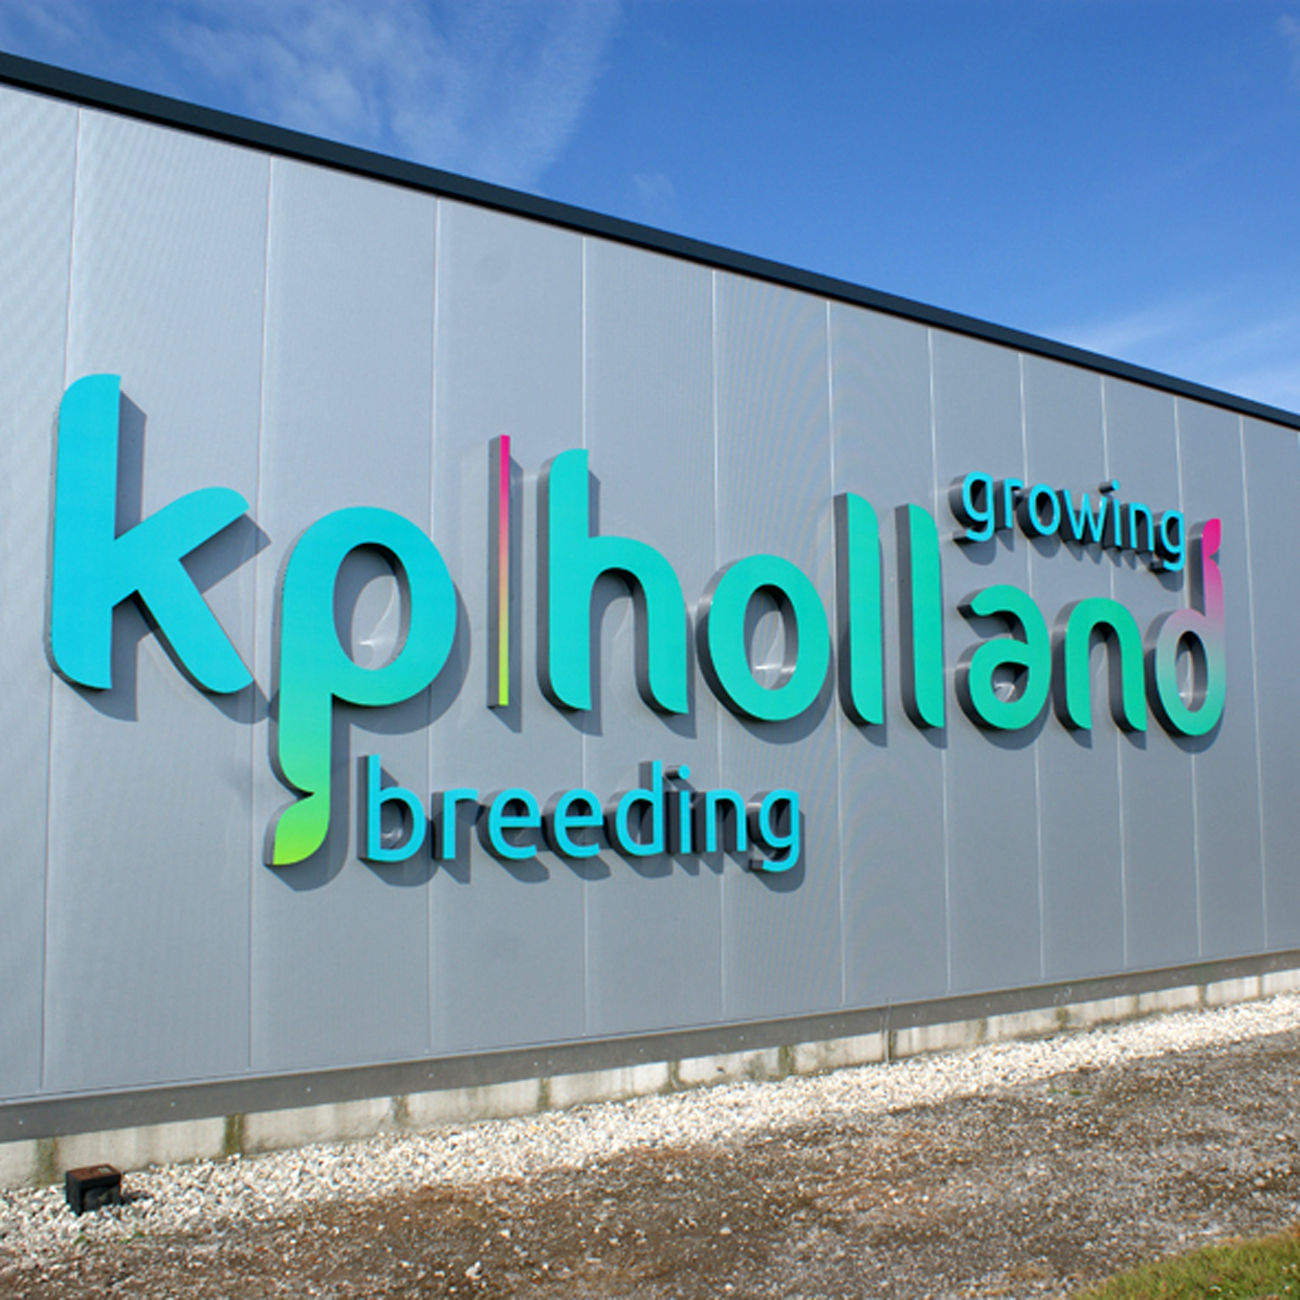 KPHolland 1300